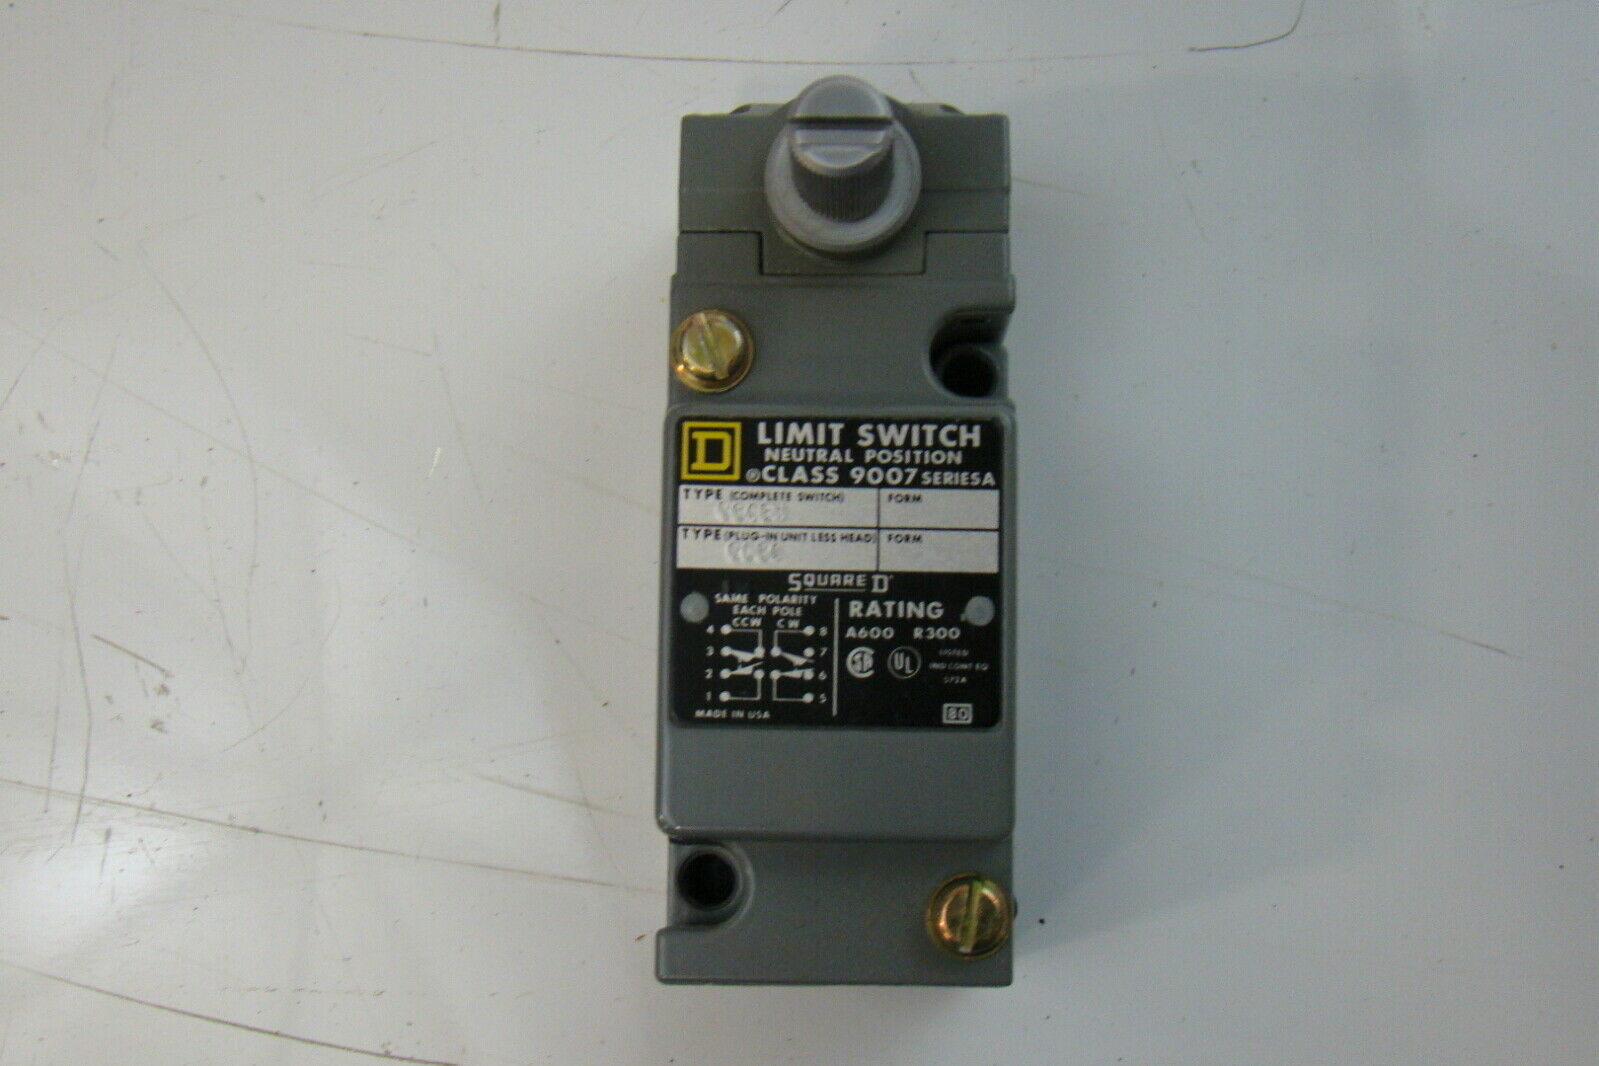 Square D 9007-C64BW Limit Switch 9007C64BW